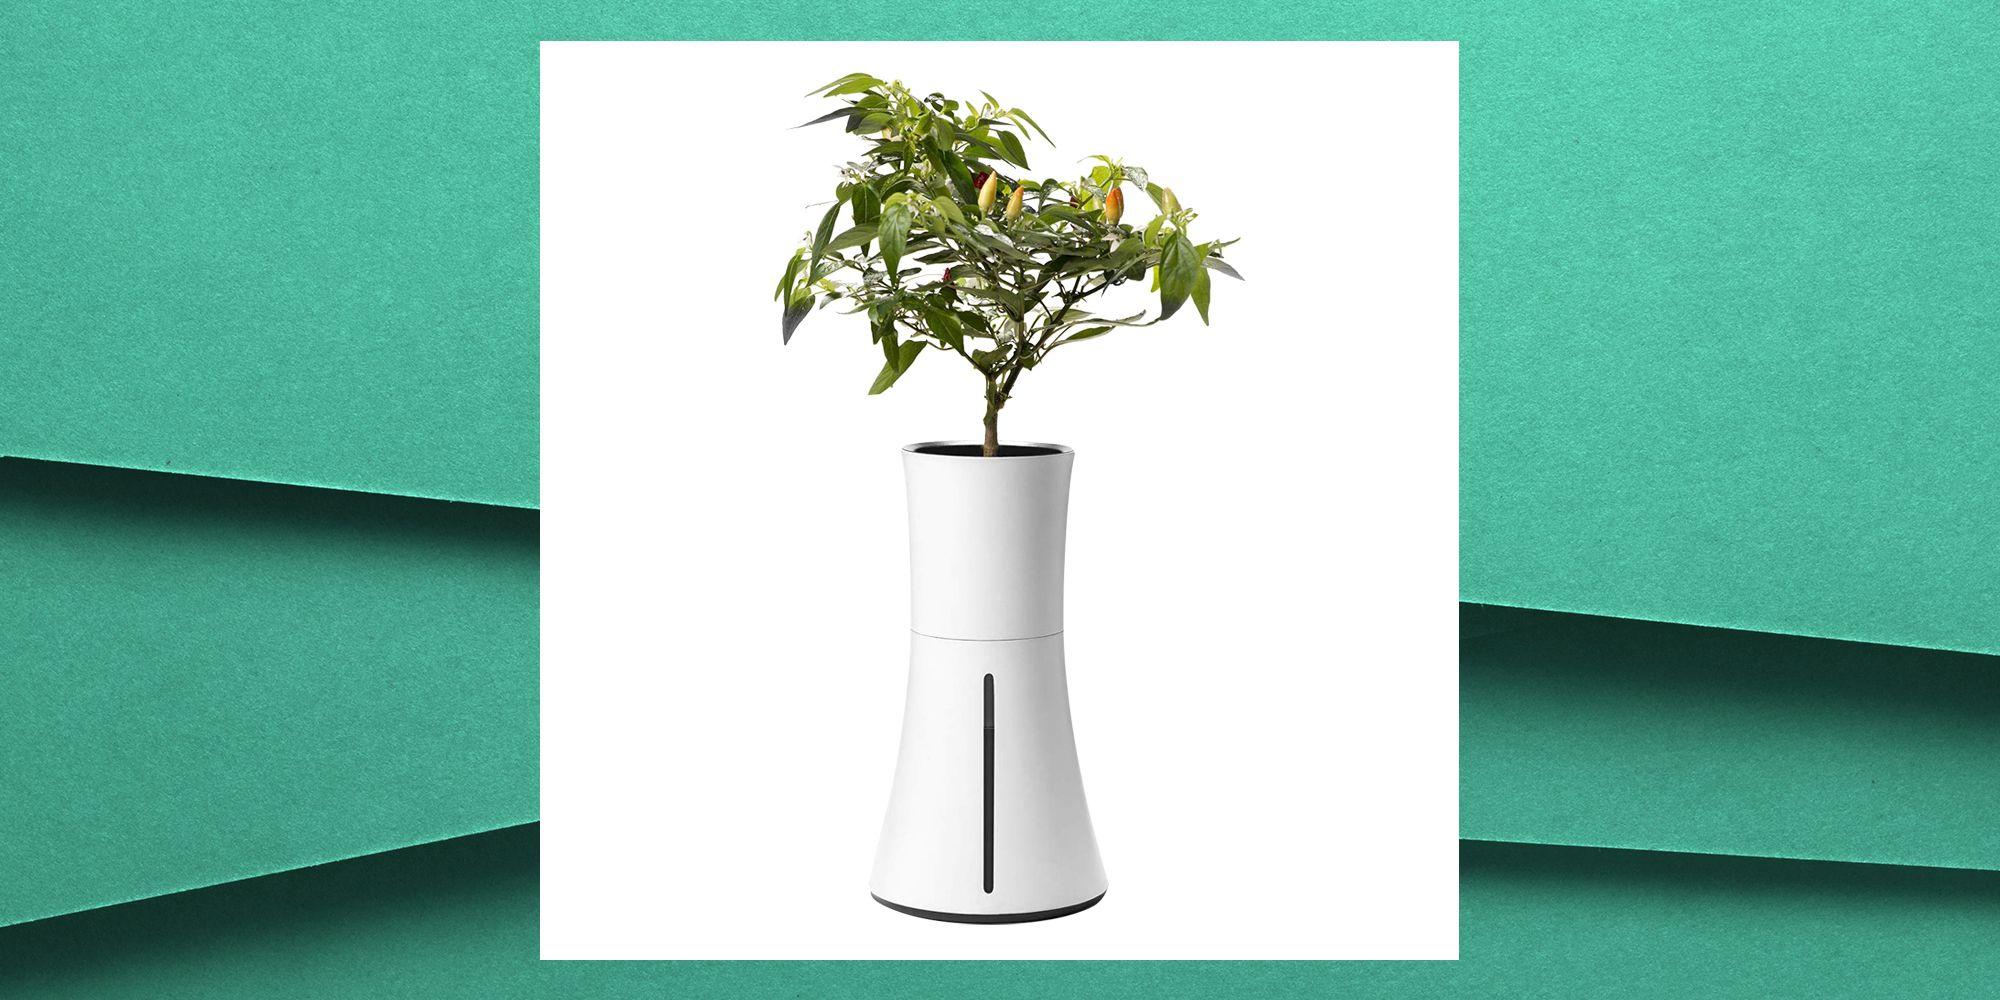 Botanium's Self-Watering Pot Is The Secret To Finally Scoring A Green Thumb